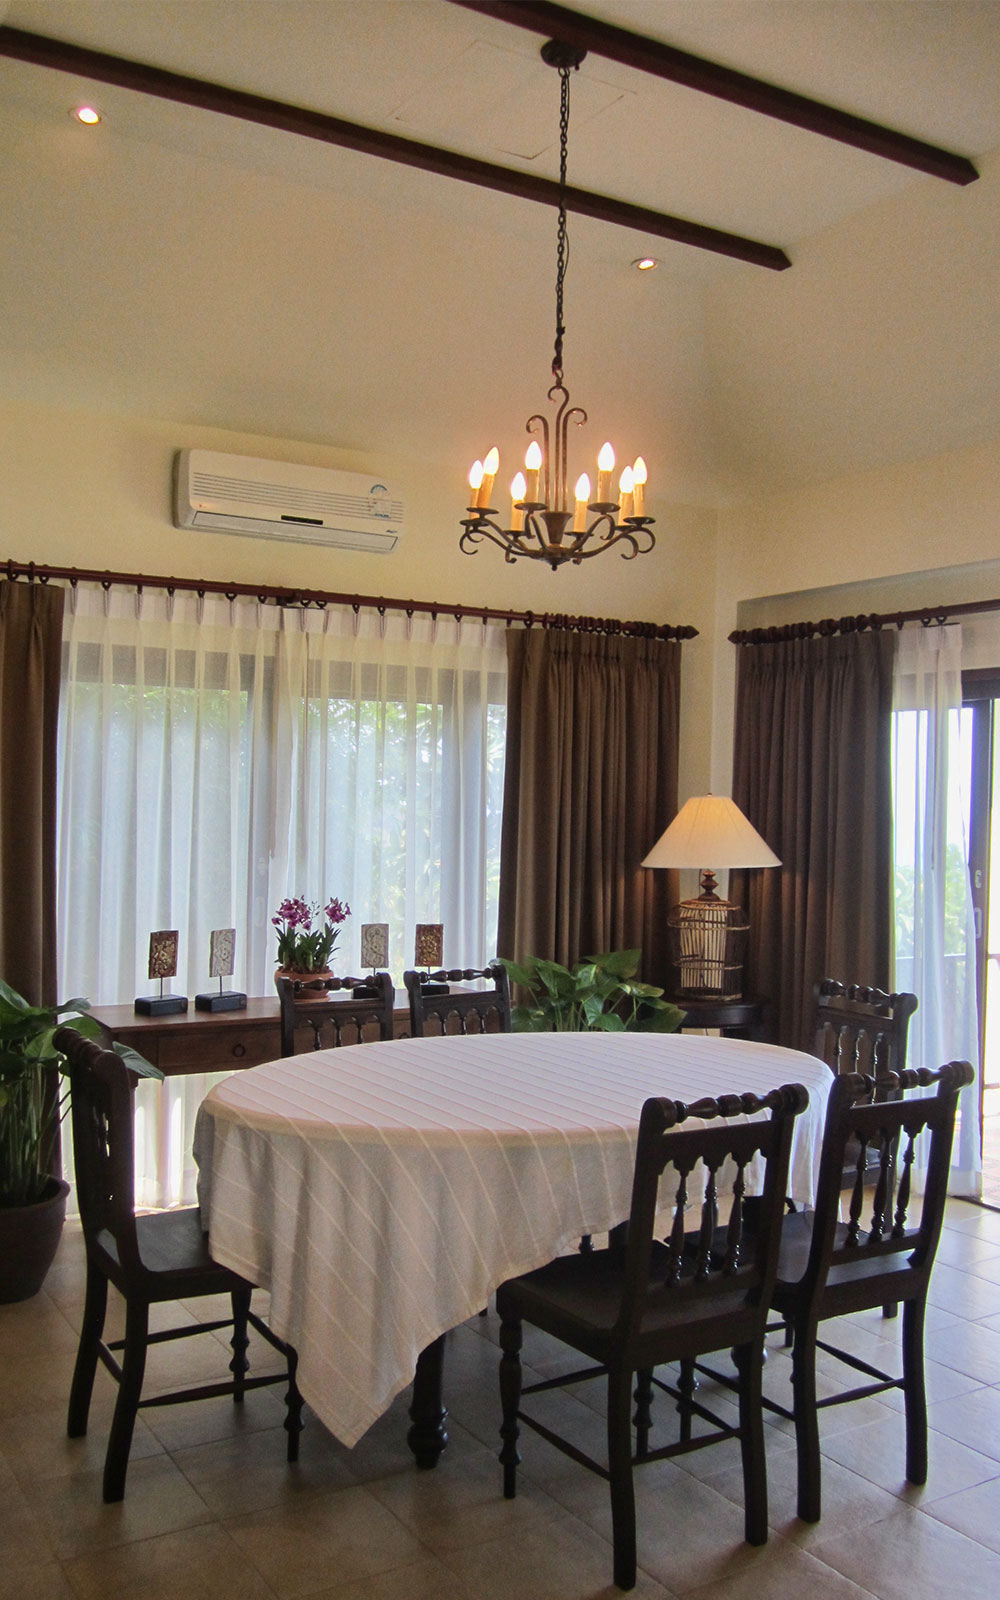 RE/MAX Island Real Estate Agency's 4 bedroom villa for rent in Bang Por, Ko Samui  6